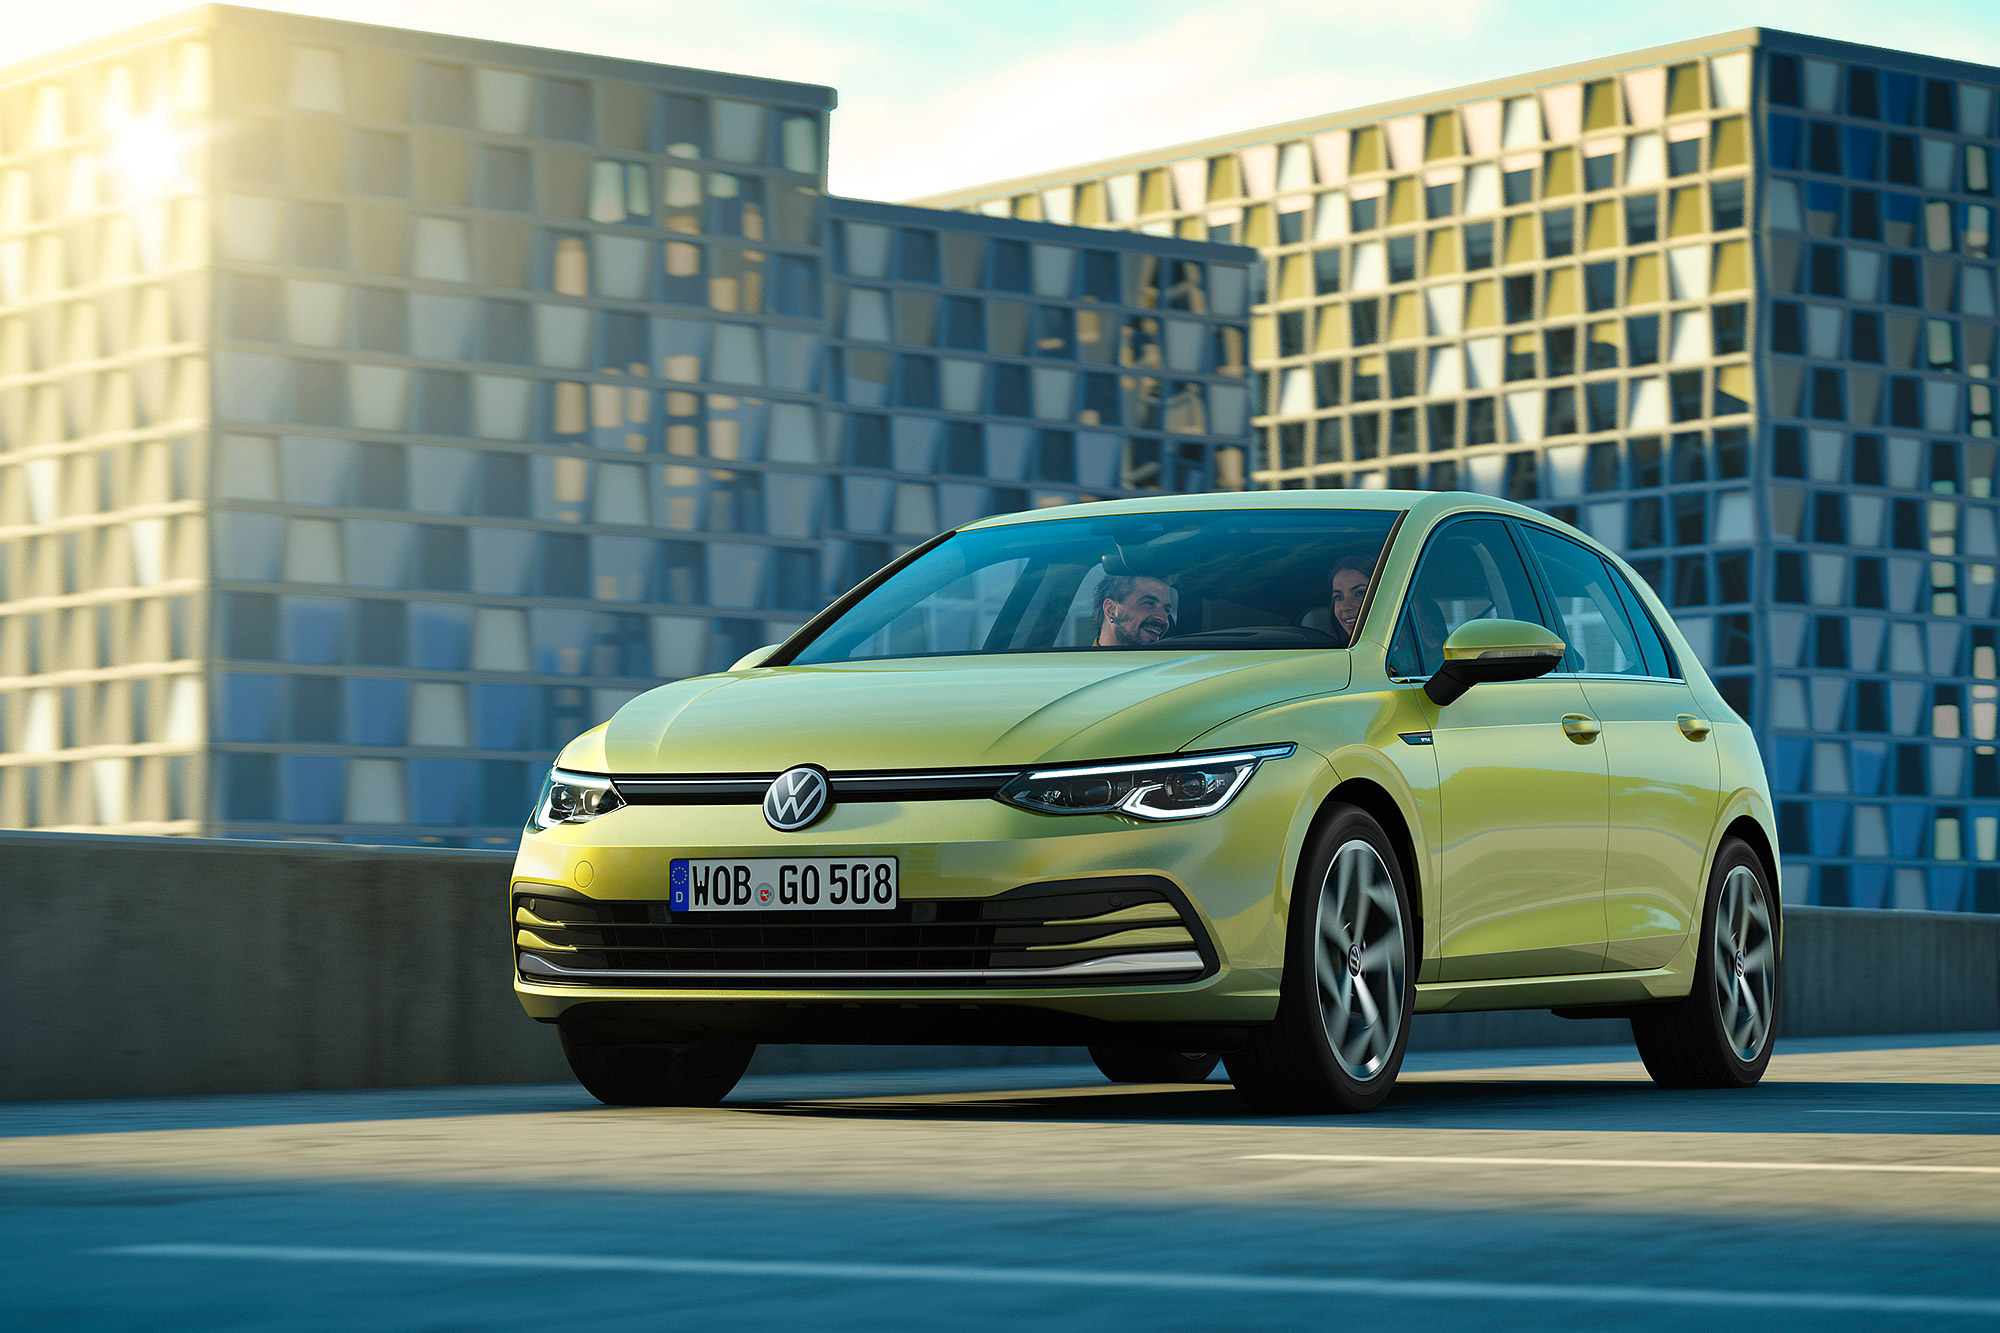 Volkswagen 透過第 8 代 Golf 的發表,宣告 48V Mild-Hybrid 走入量產市售。